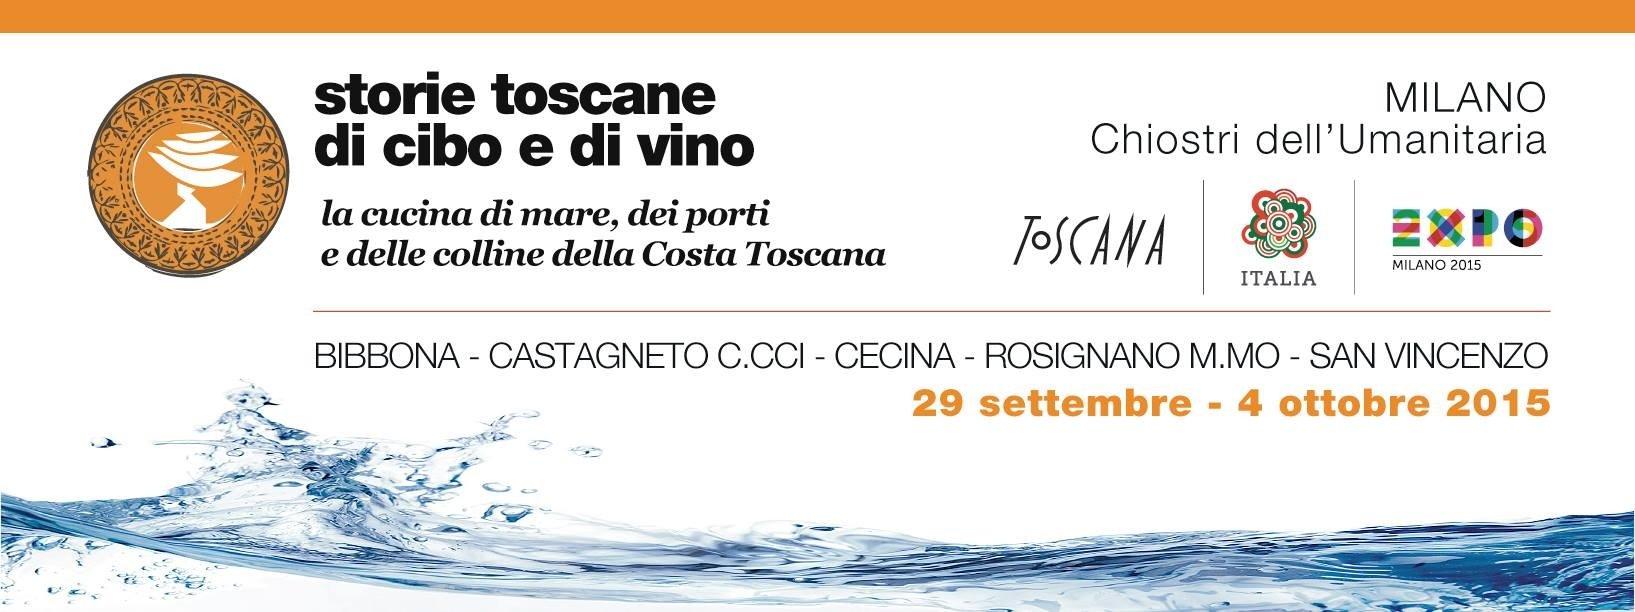 Storie toscane di vino e cibo, a Milano un fuori Expo